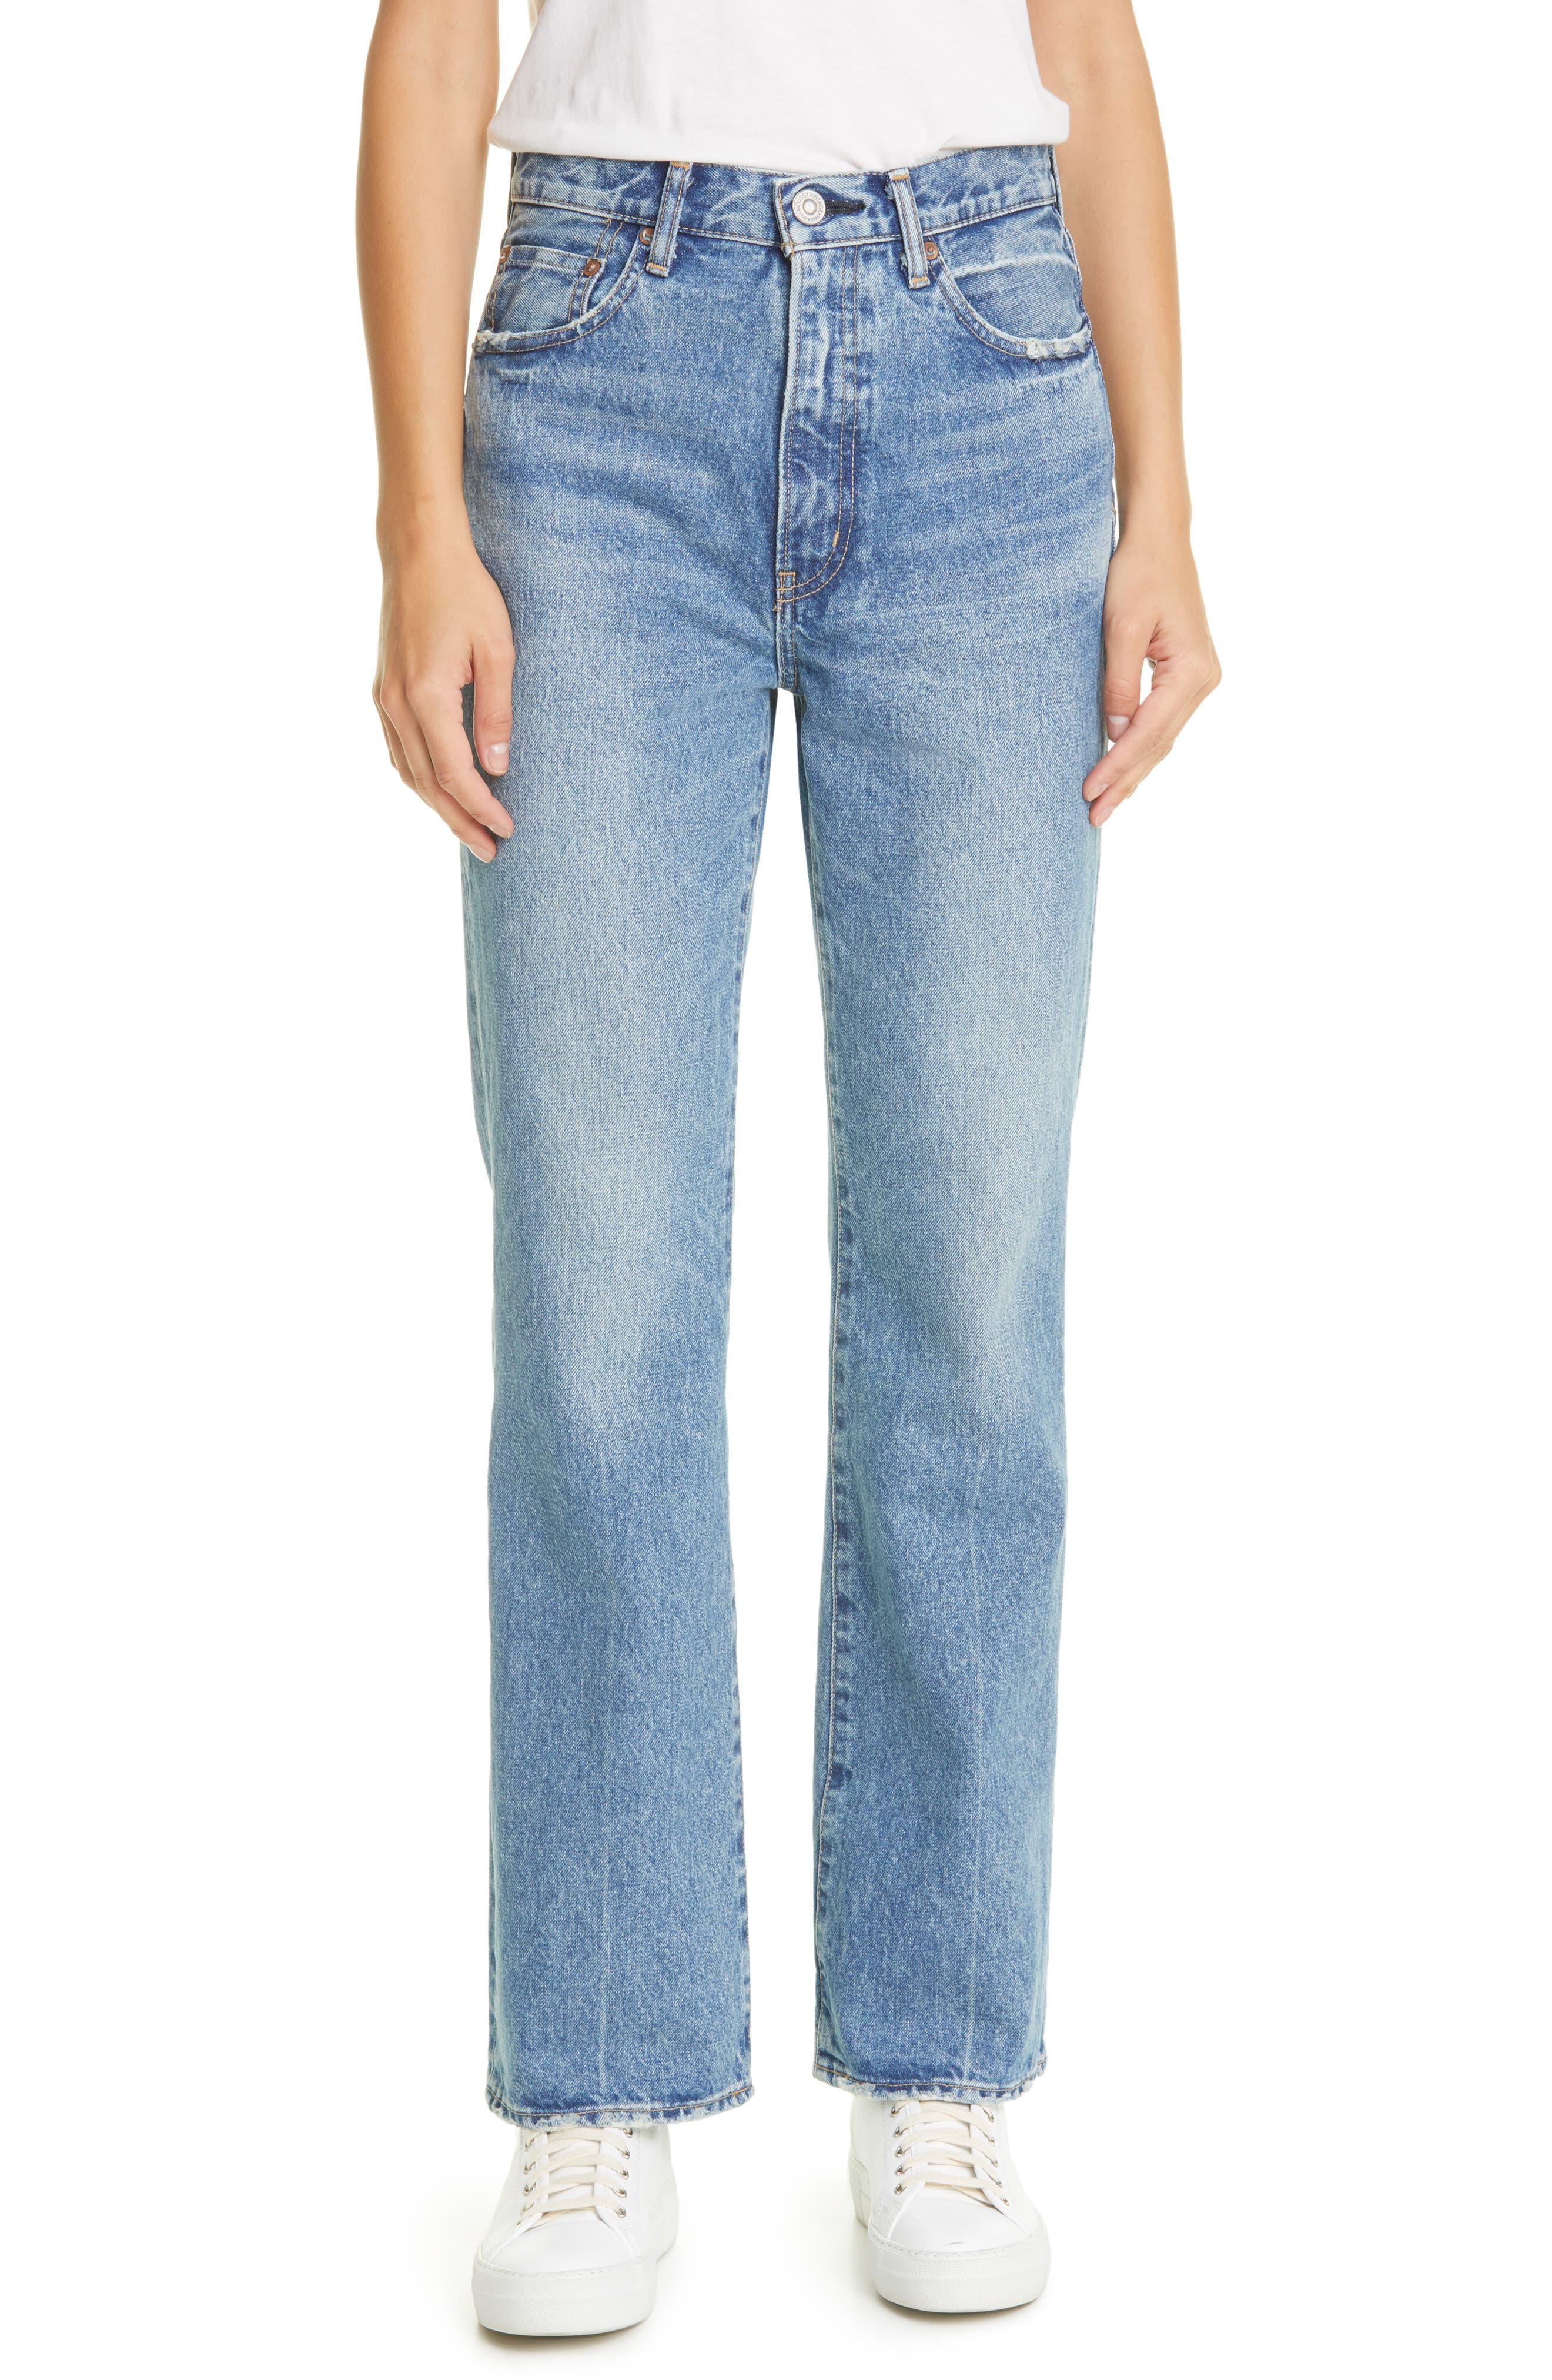 Luna High Waist Ankle Straight Flare Jeans